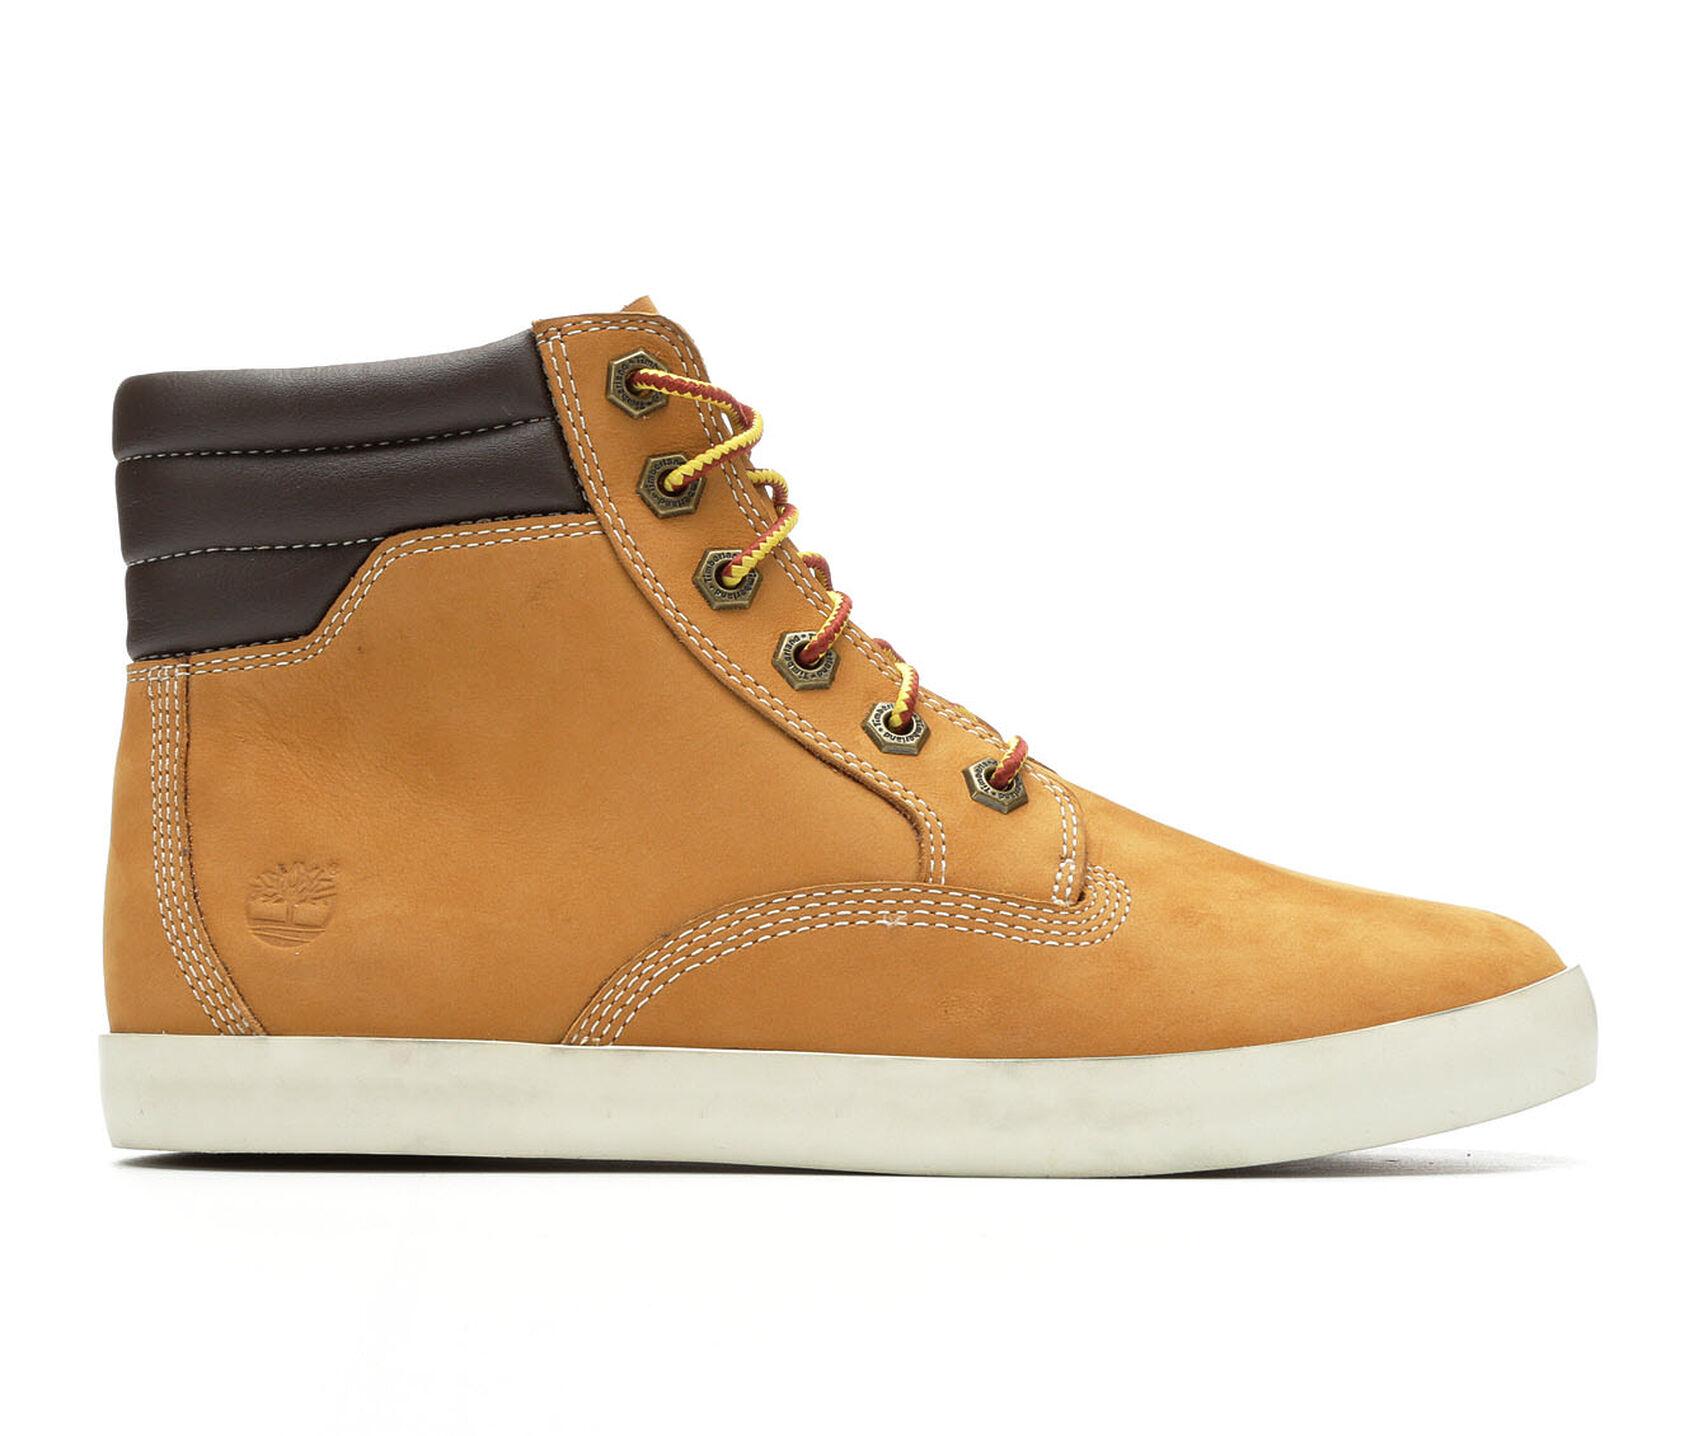 Shoe Carnival Womens Timberland Boots